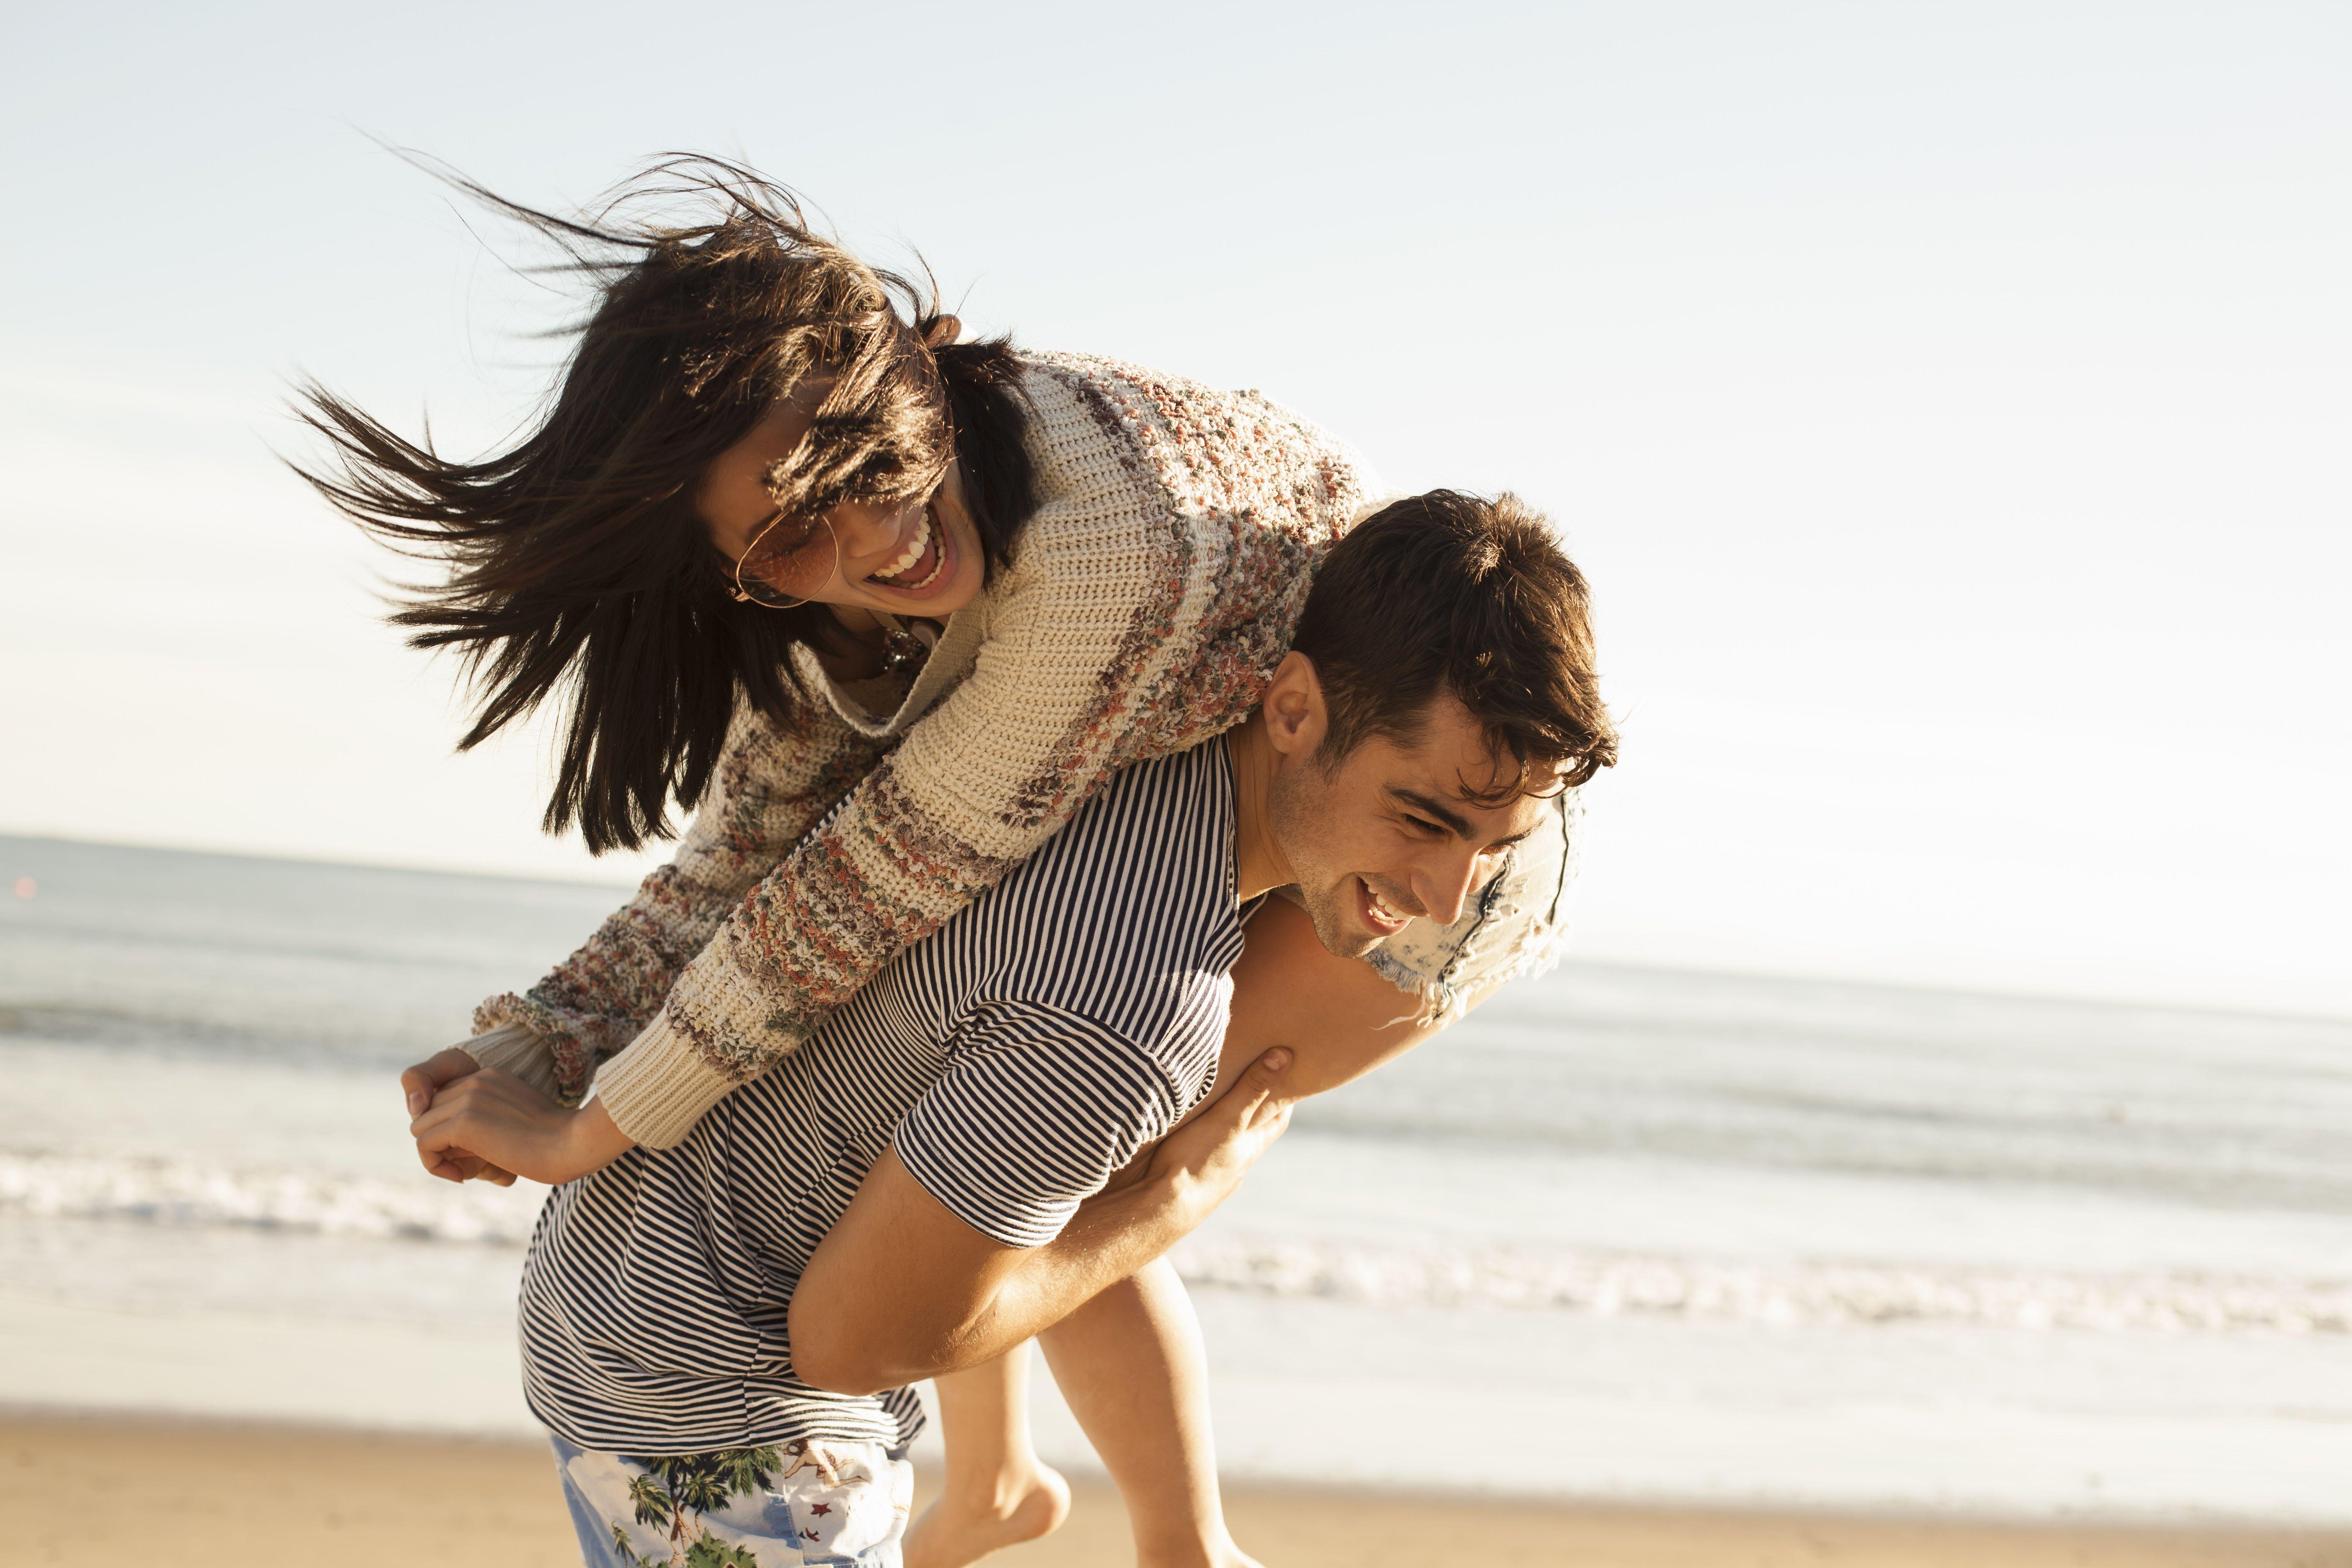 online dating geld besparen expert